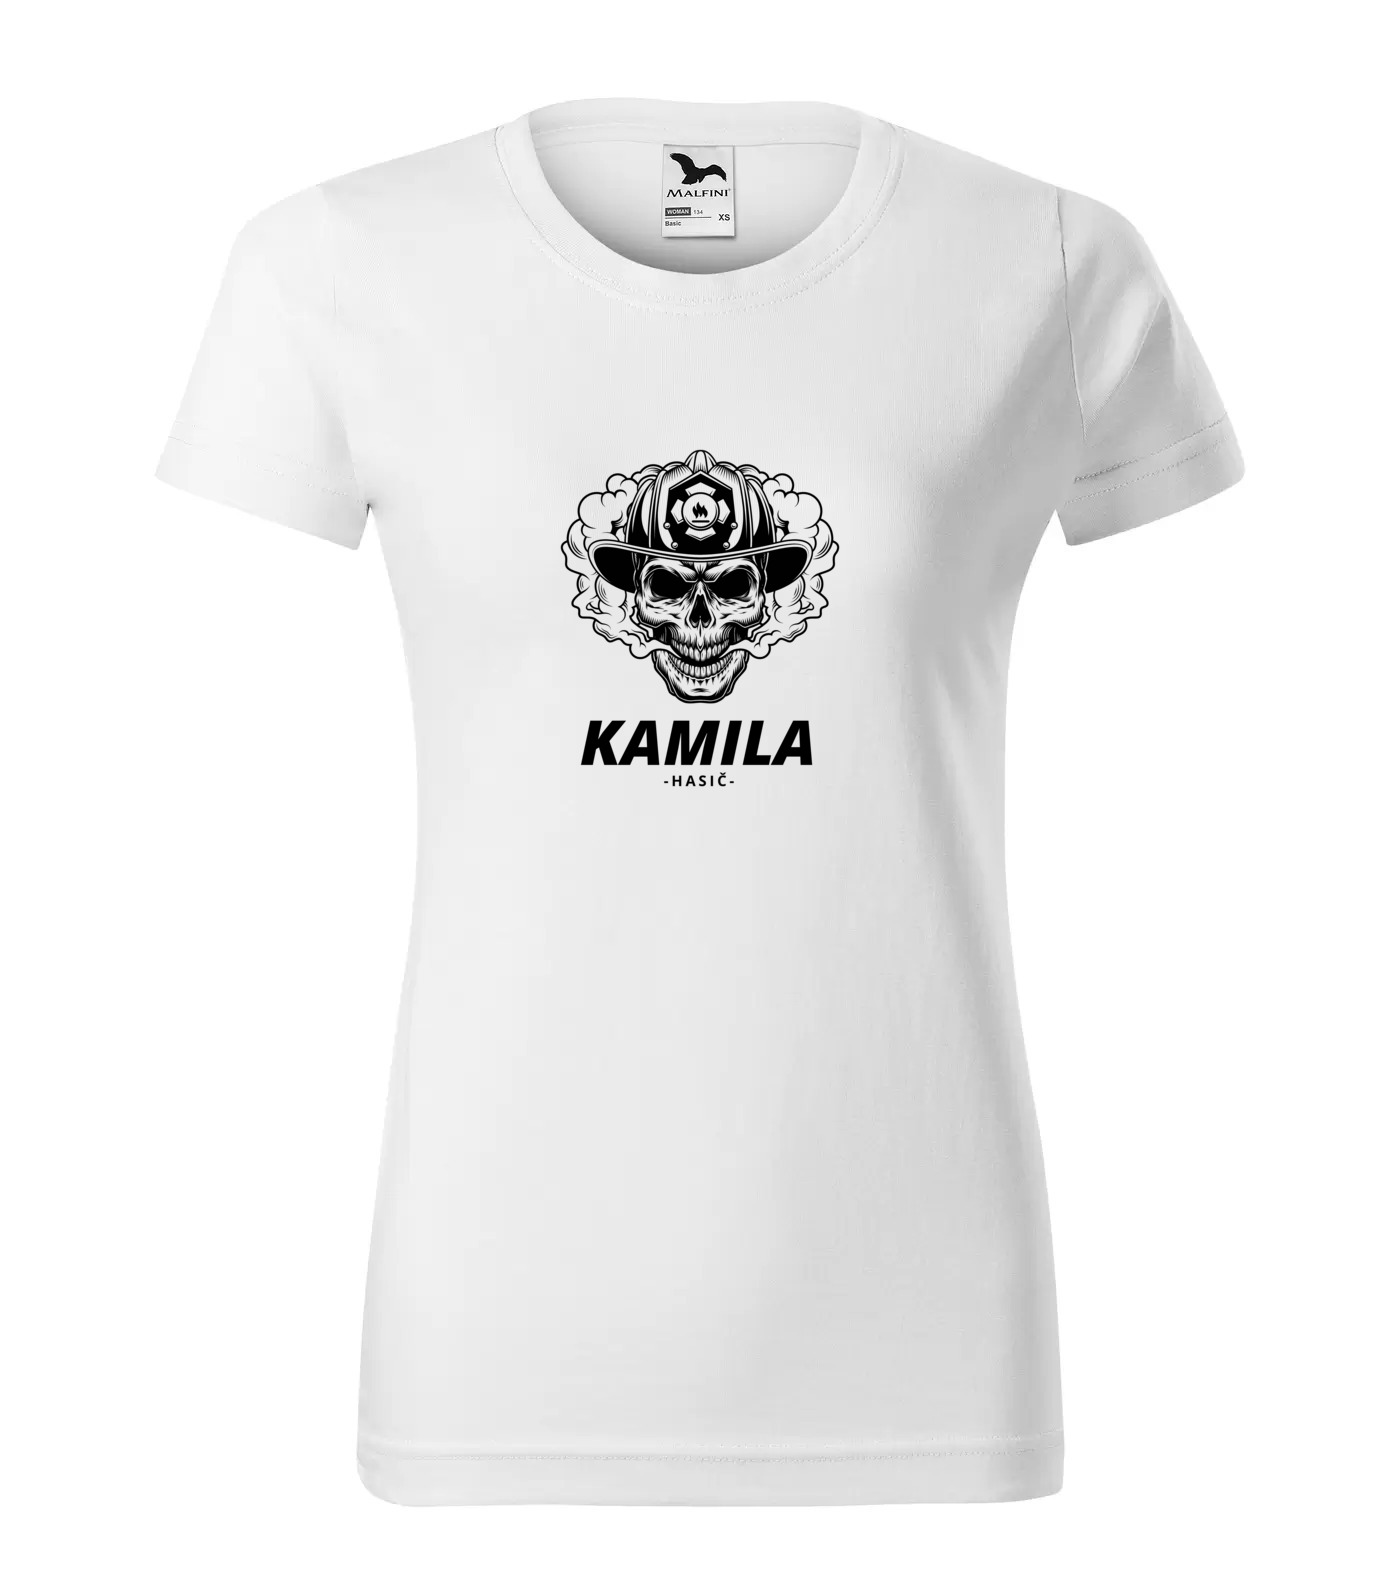 Tričko Hasič Kamila